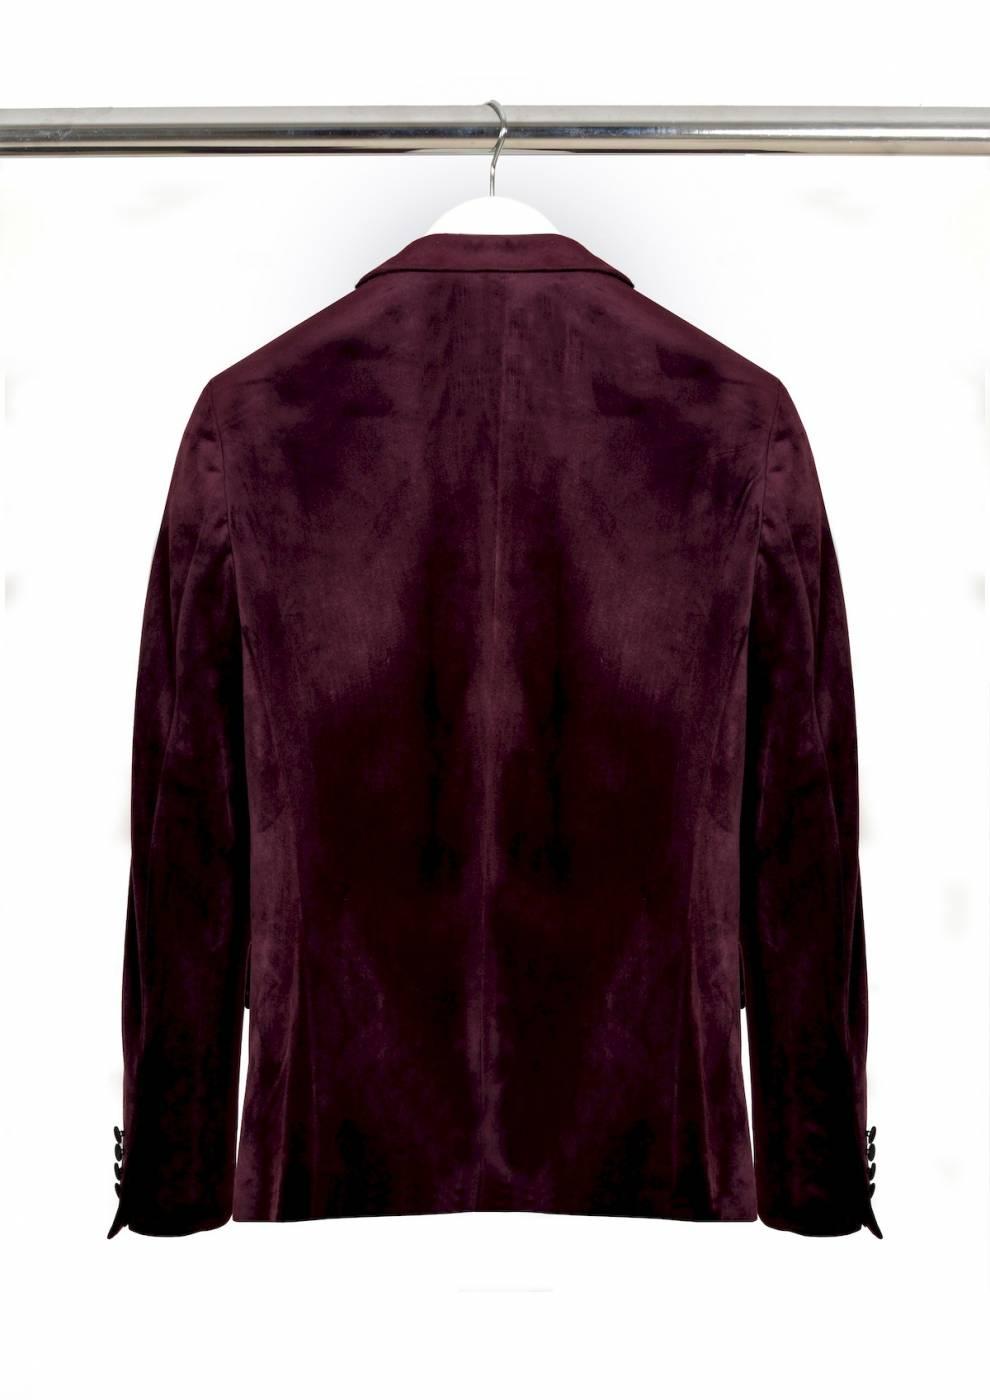 2.Jackson-Purple2-small